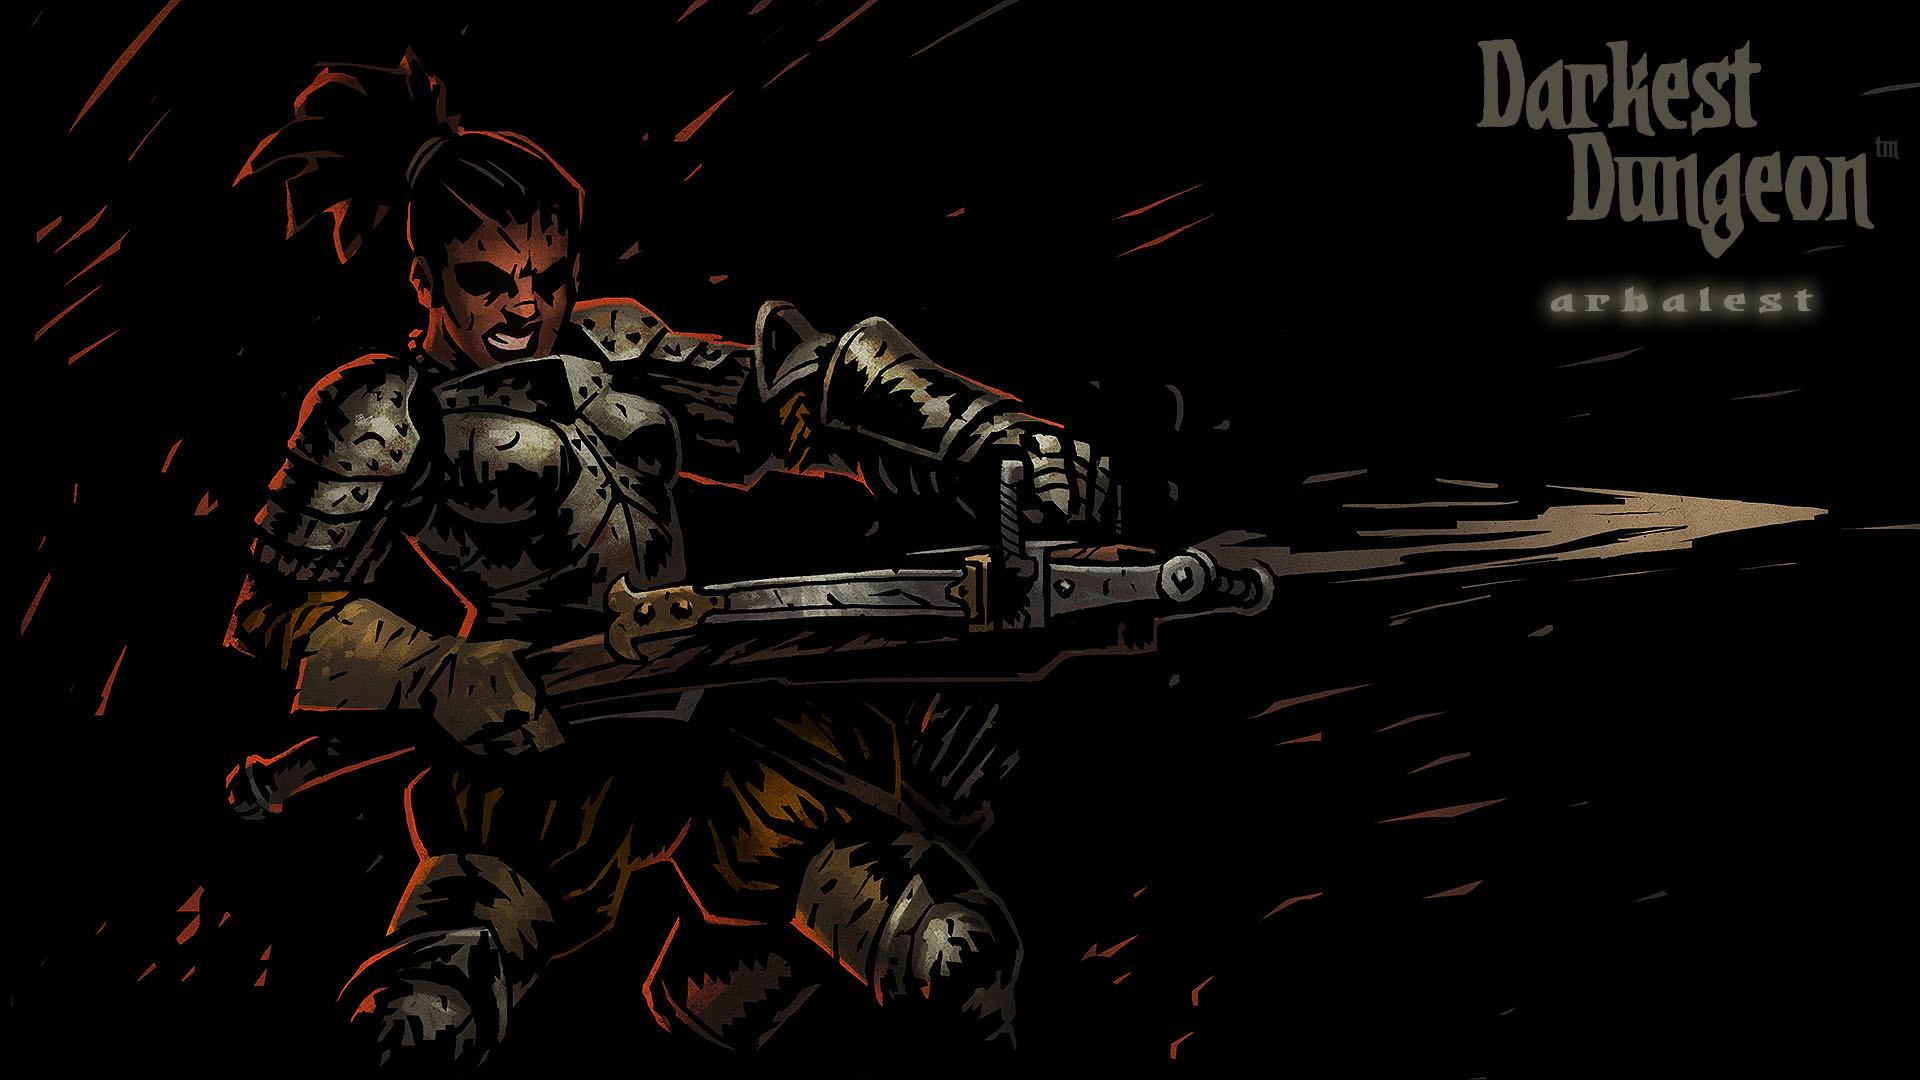 Wallpapers Darkest Dungeon - MaximumWall